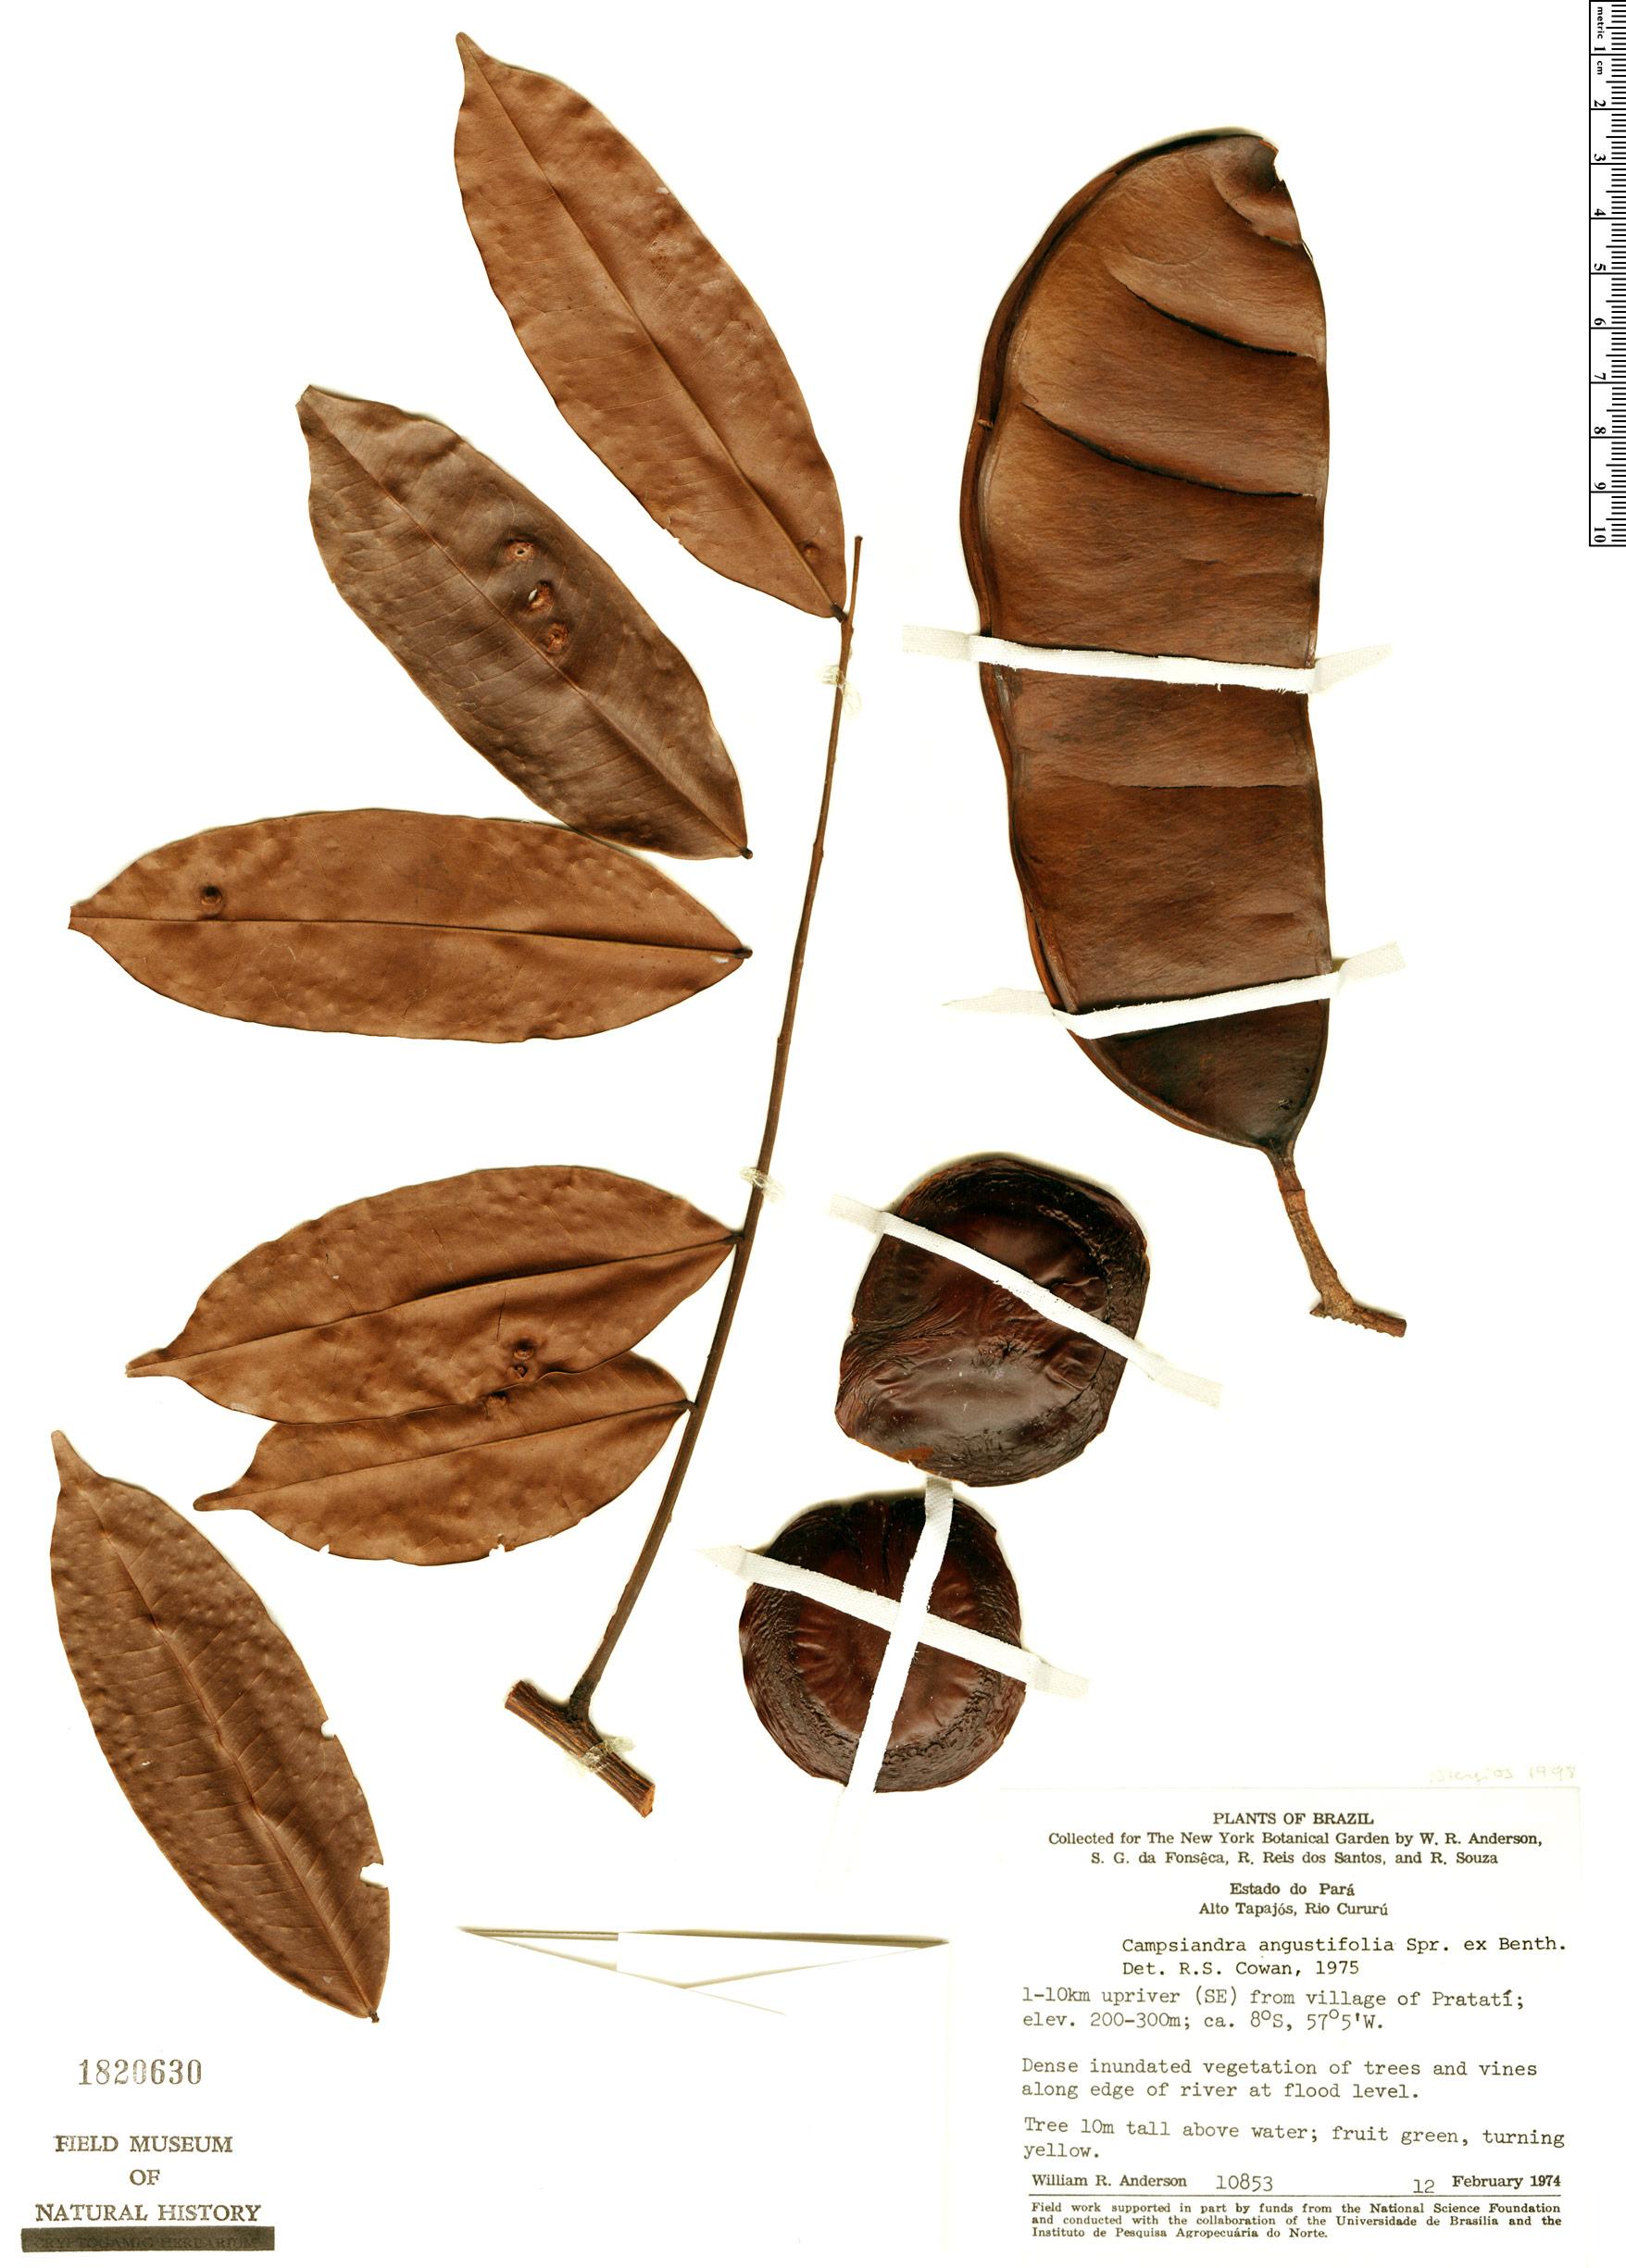 Specimen: Campsiandra angustifolia